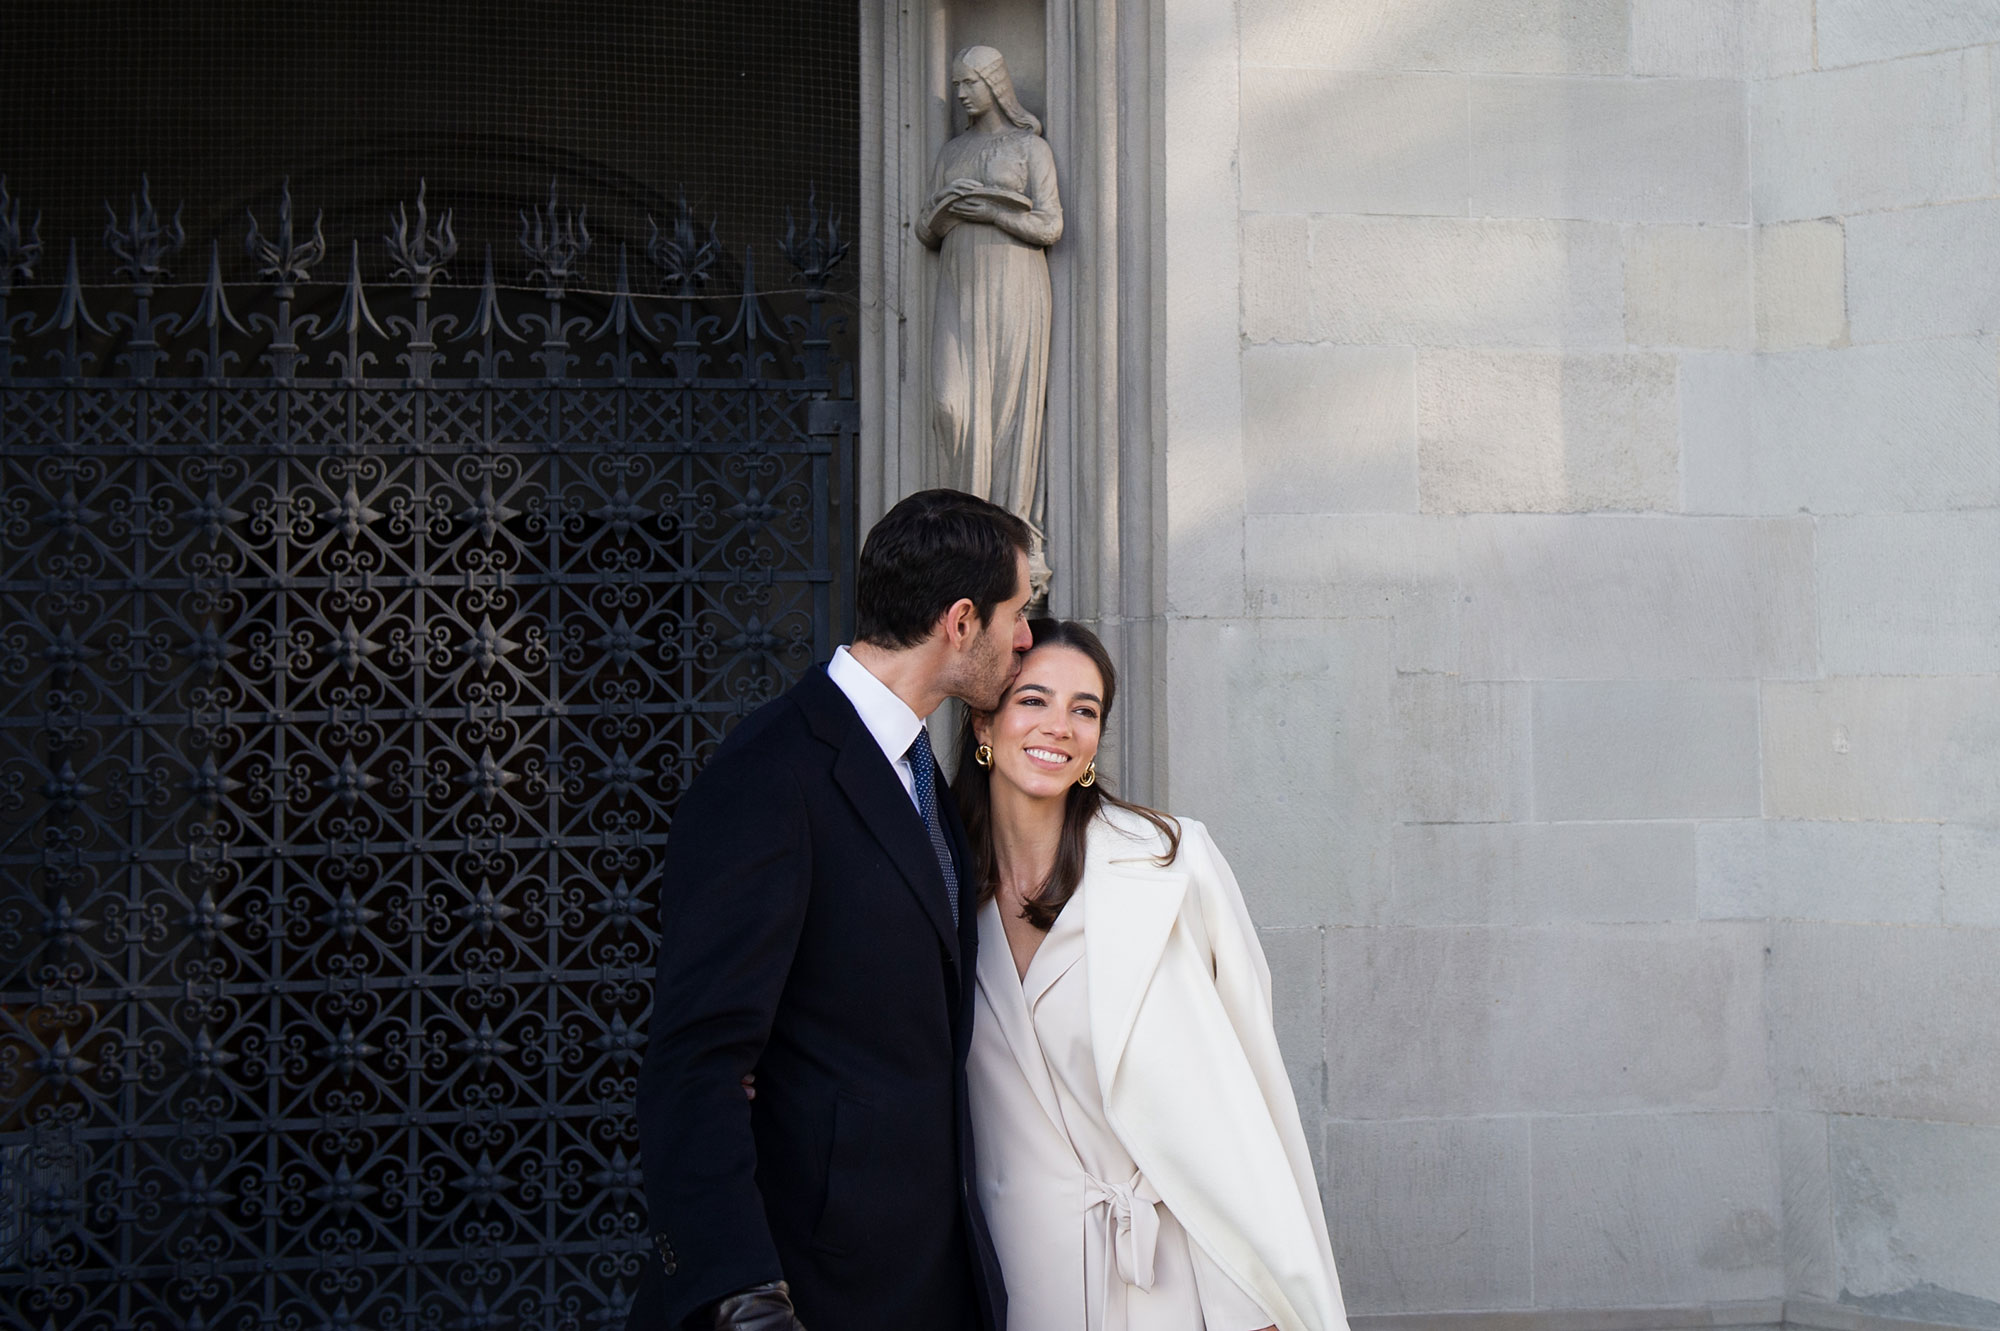 juliana-cosimo-stadthaus-wedding-46.jpg